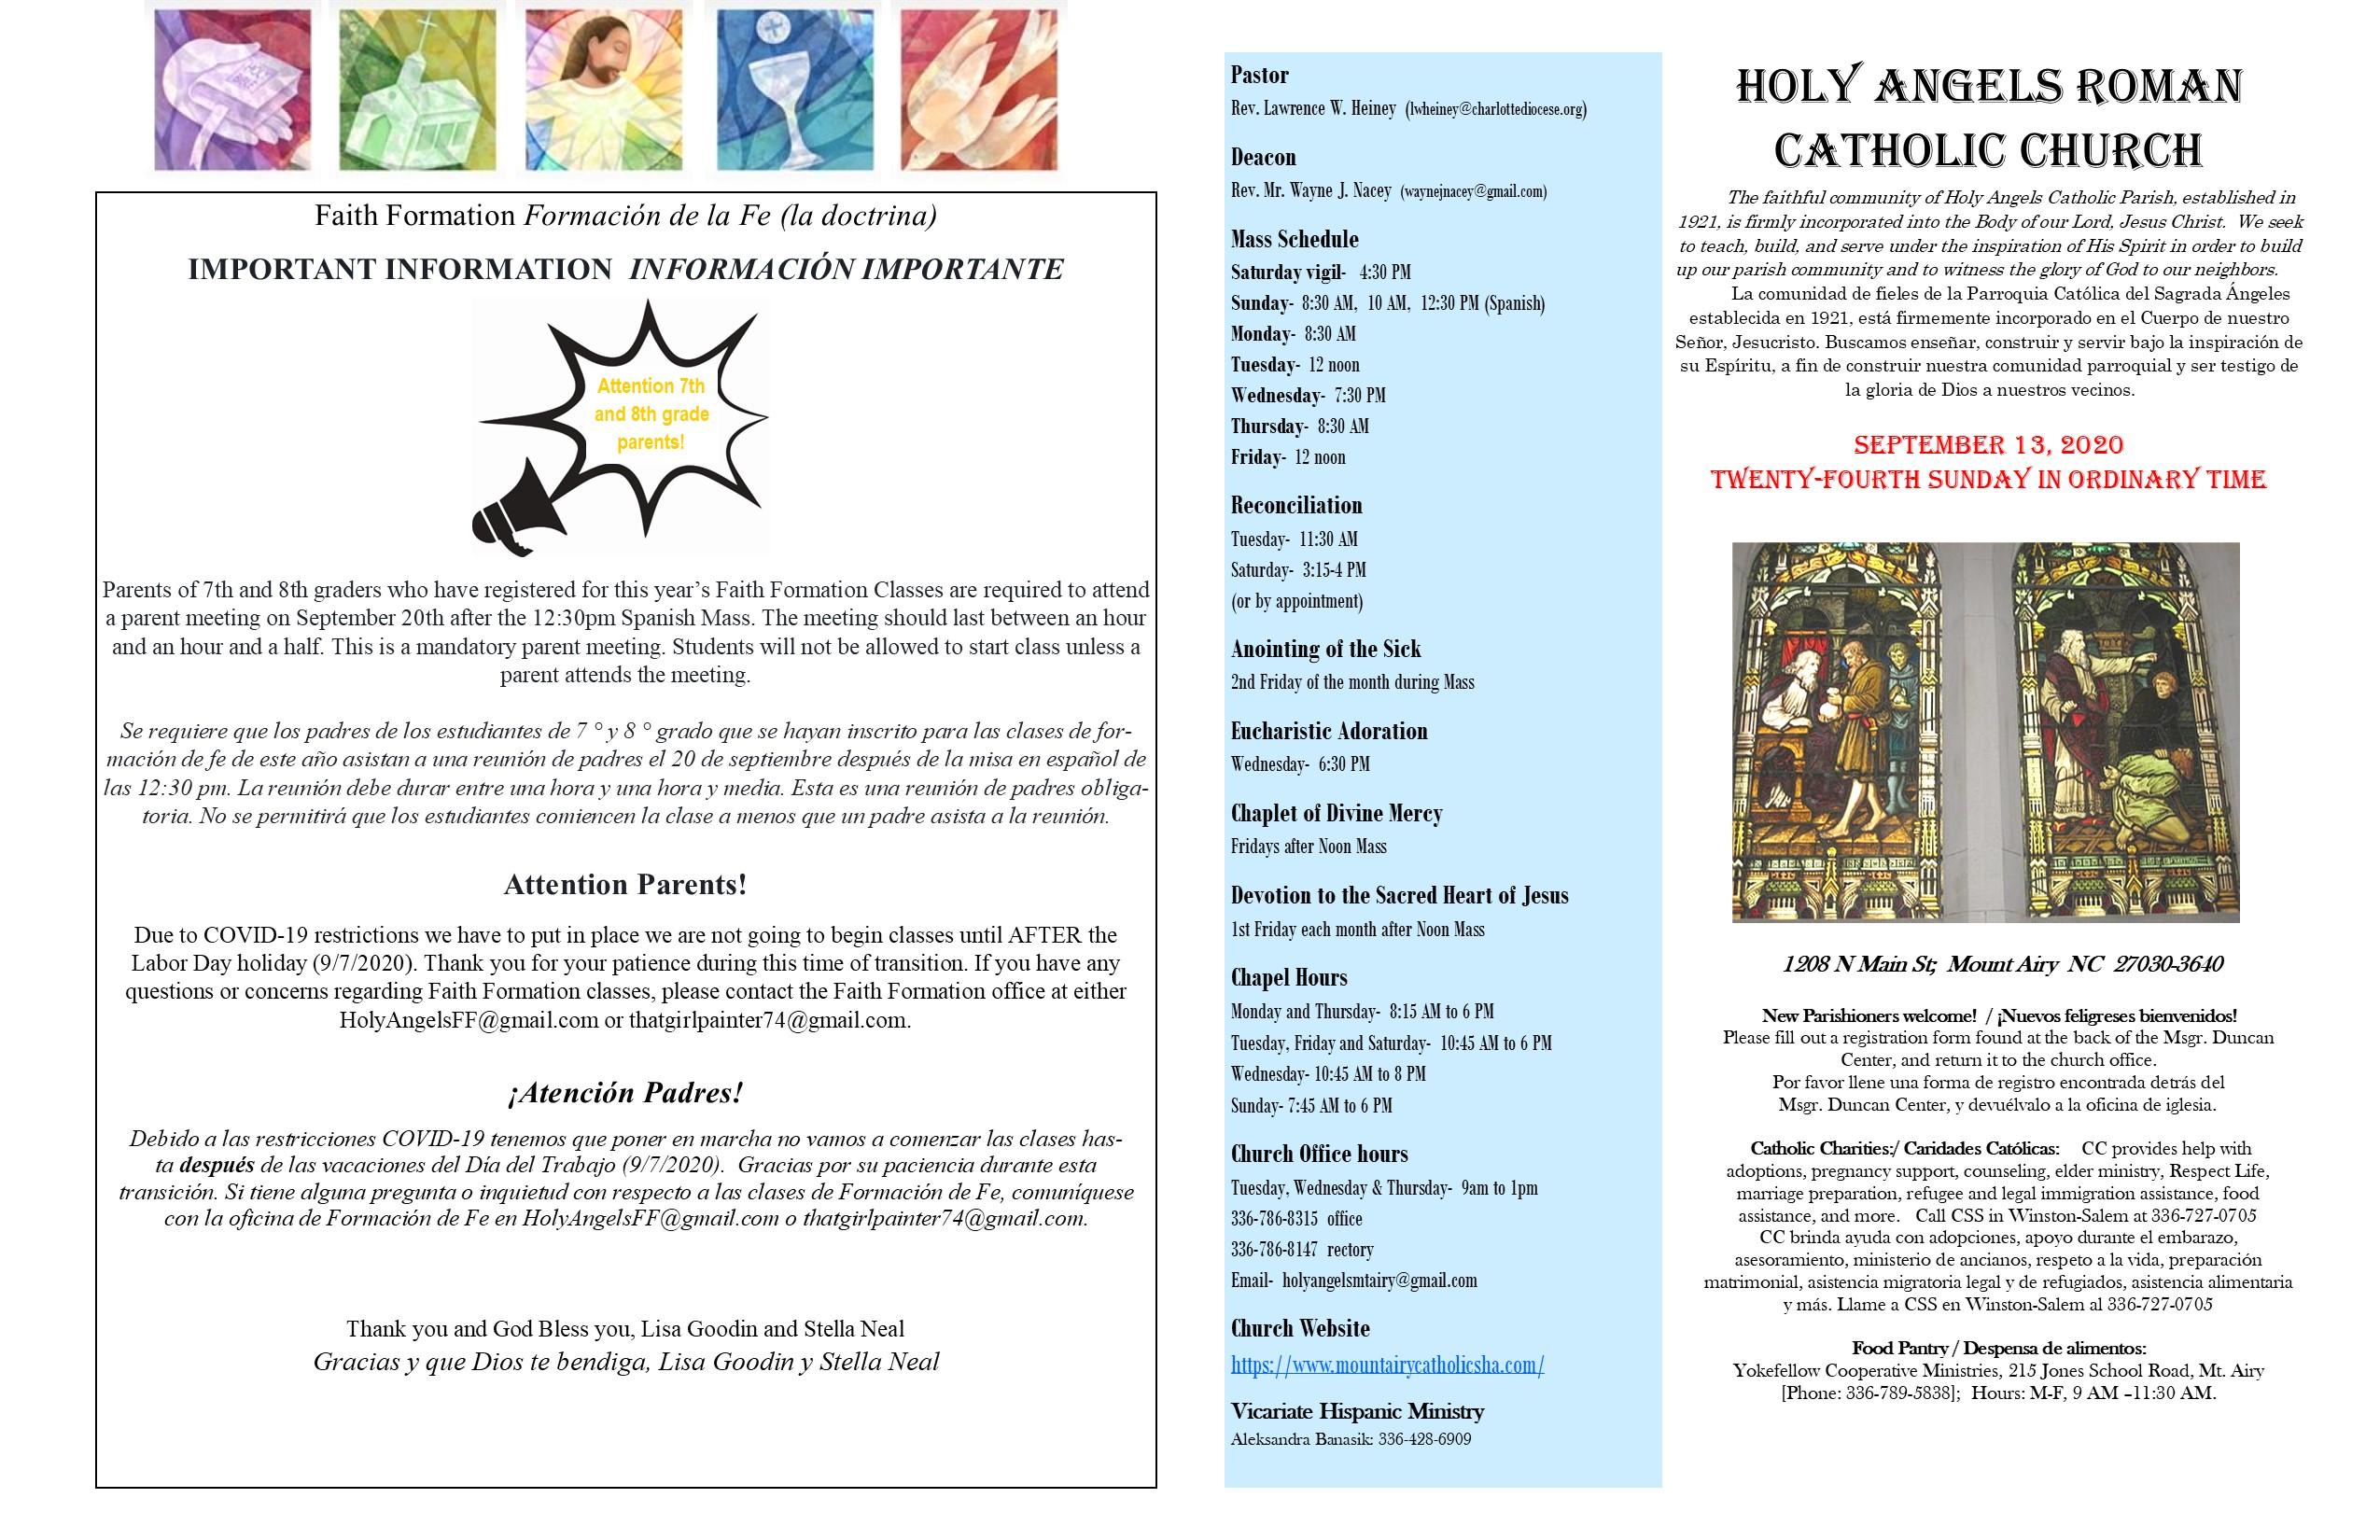 September 13 2020 page 1.jpg